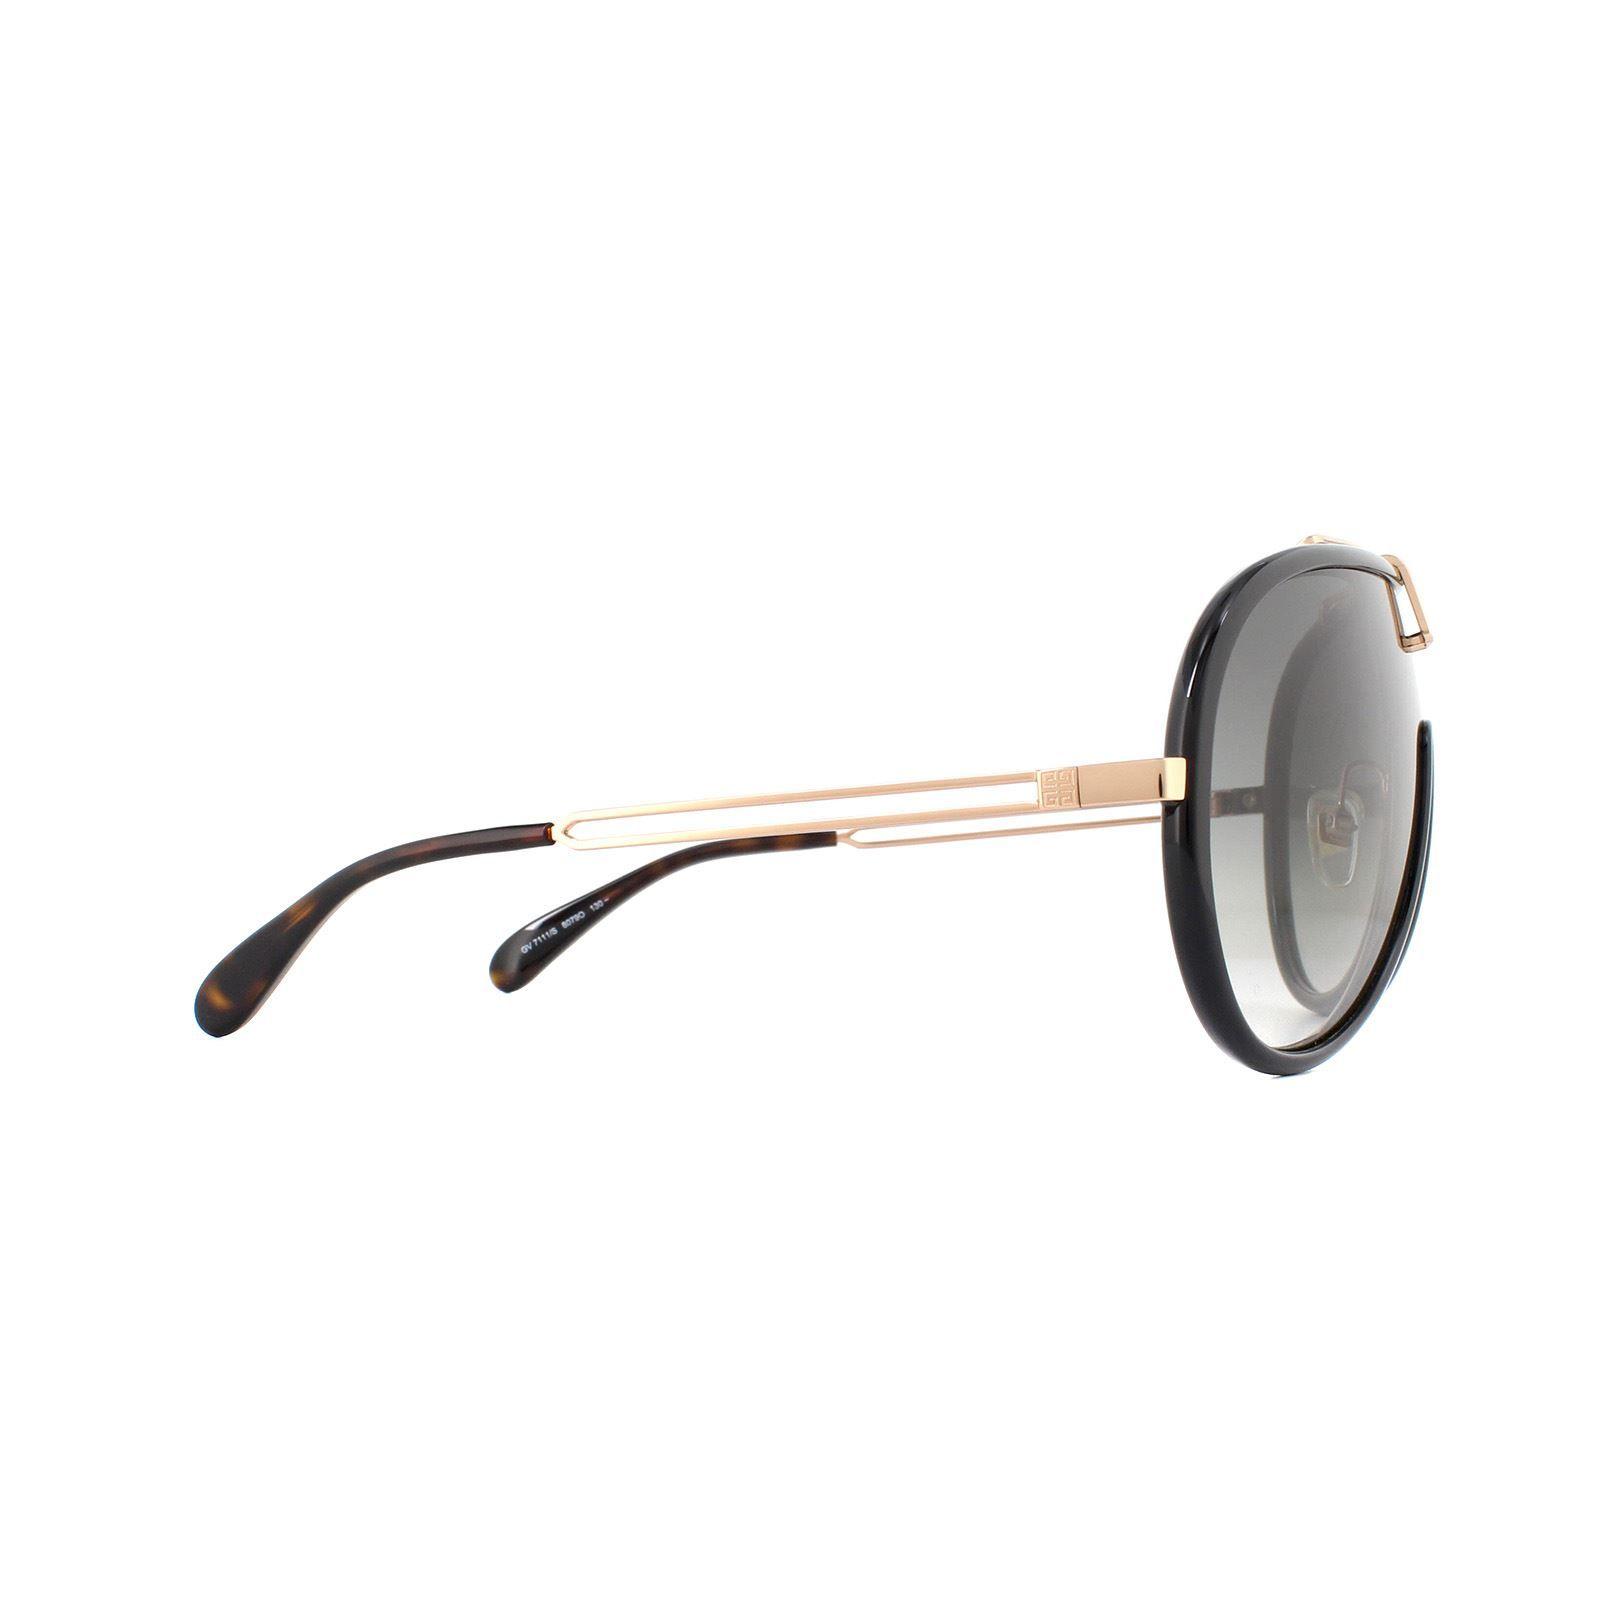 Givenchy Sunglasses GV 7111/S 807 9O Black Dark Grey Gradient